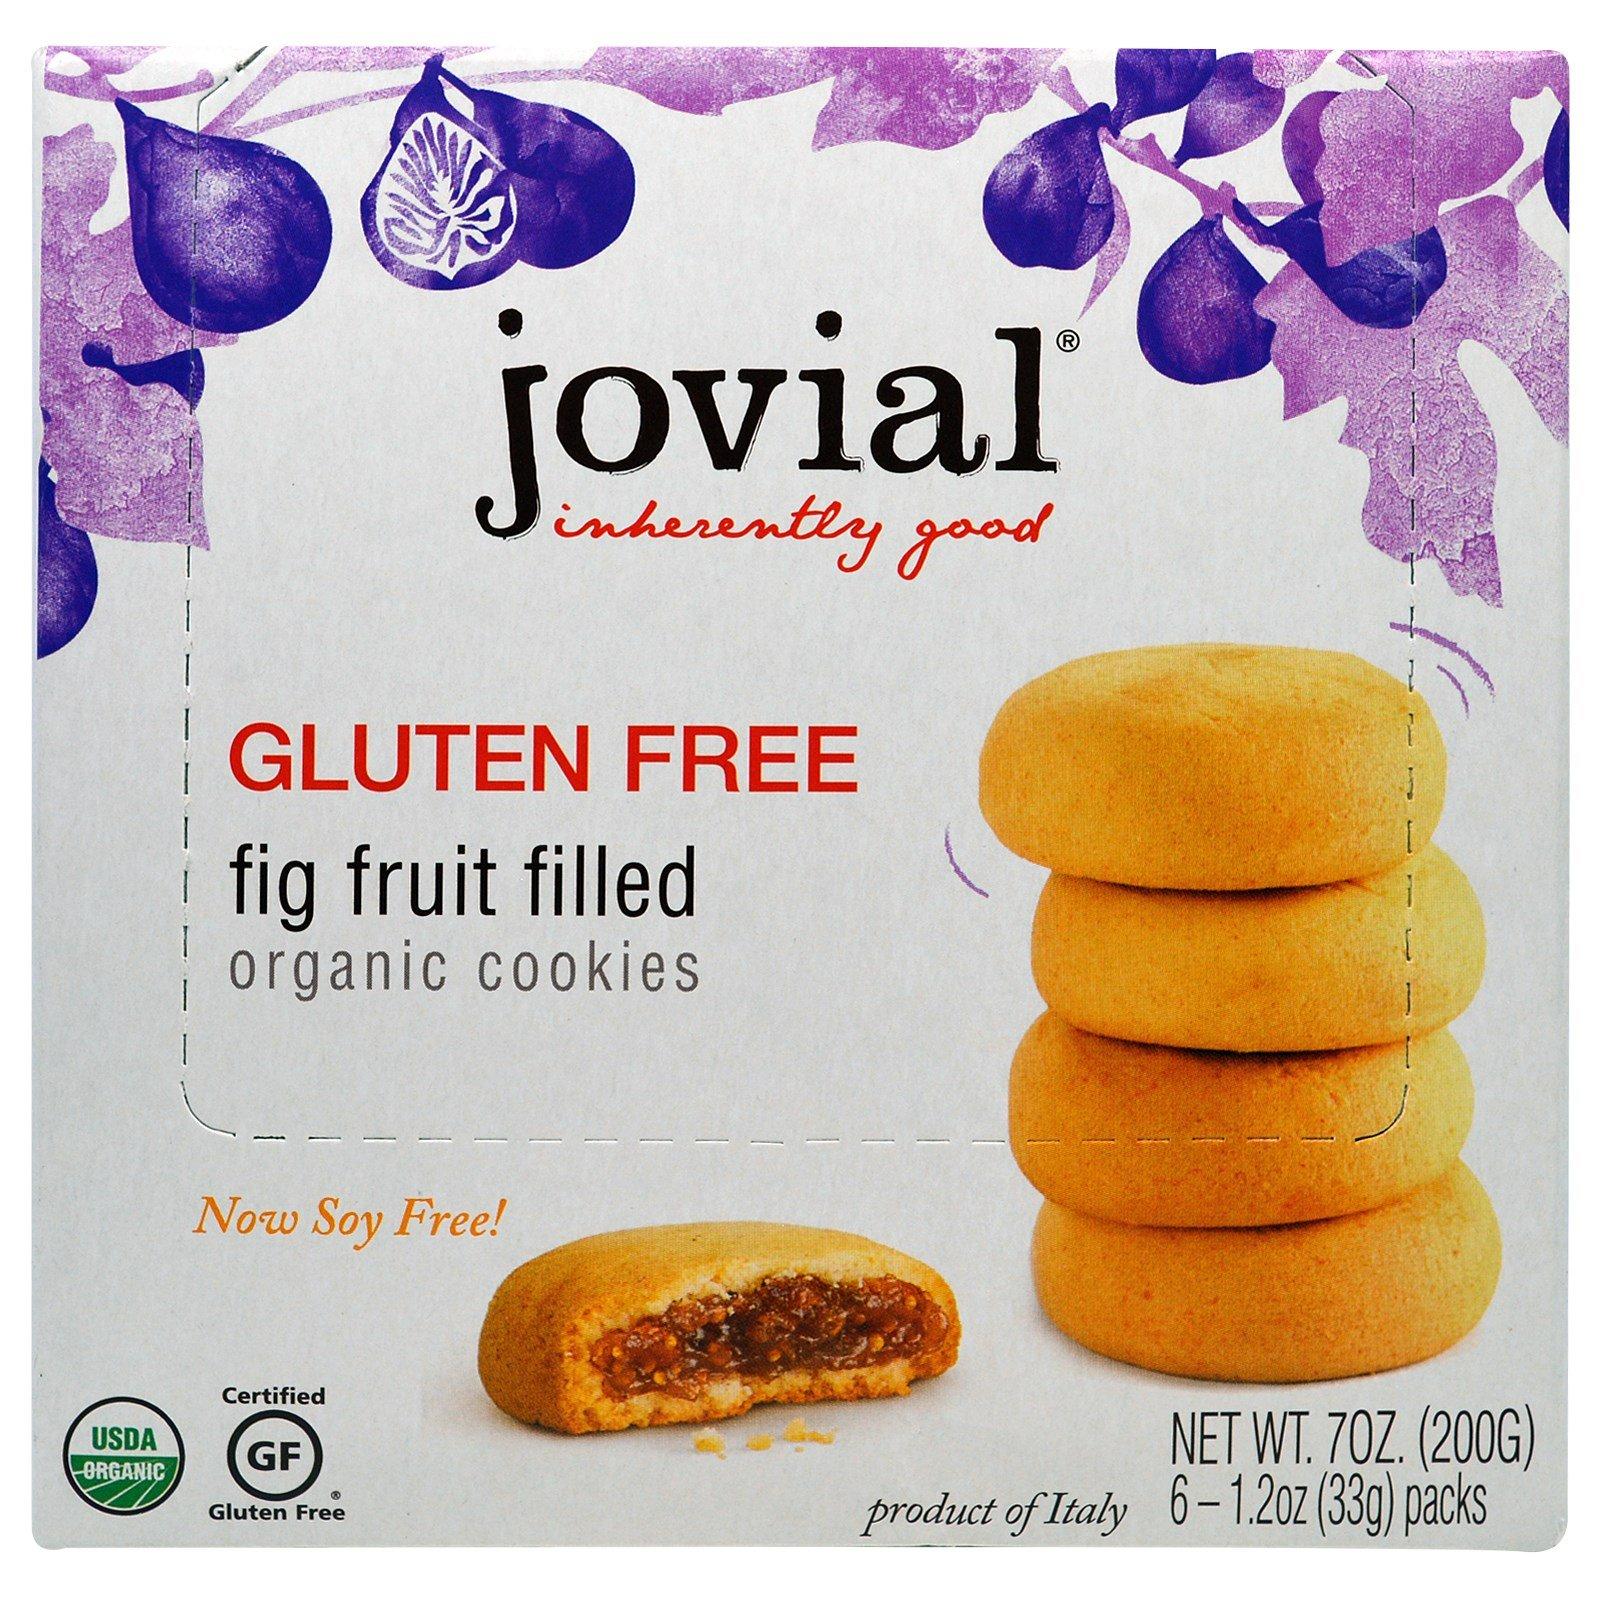 Jovial, Organic Cookies, Fig Fruit Filled, 6 Packs, 1.2 oz (33 g) Each - 3PC